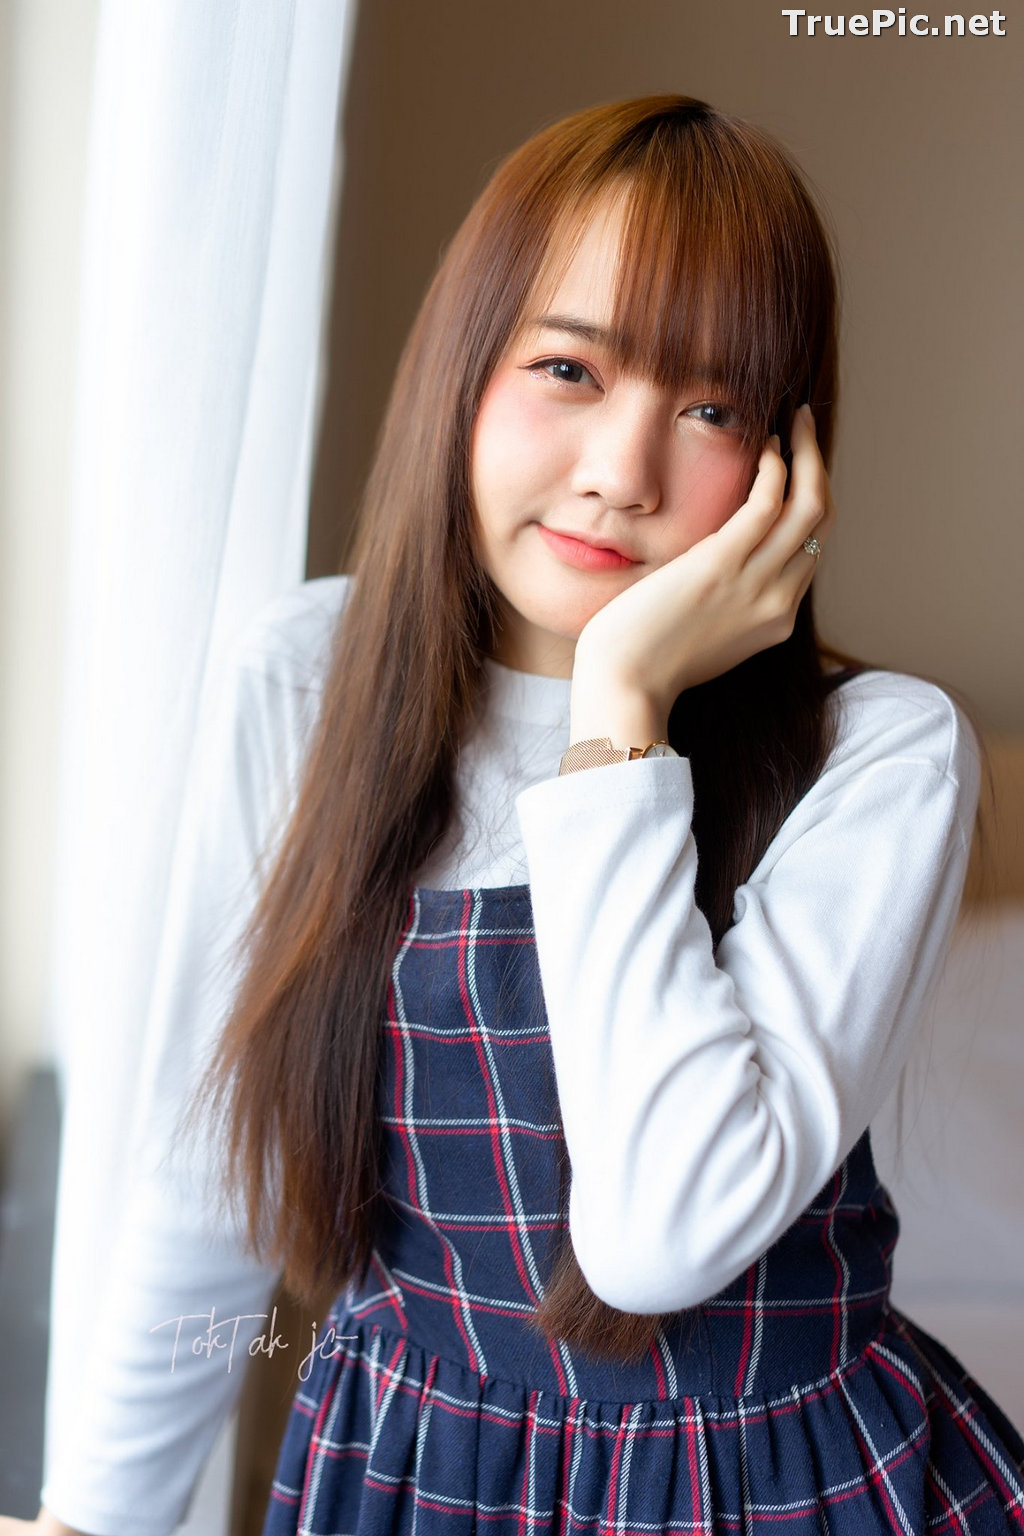 Image Thailand Model - Fenfern Aeryingsak - Cute School Girl - TruePic.net - Picture-4